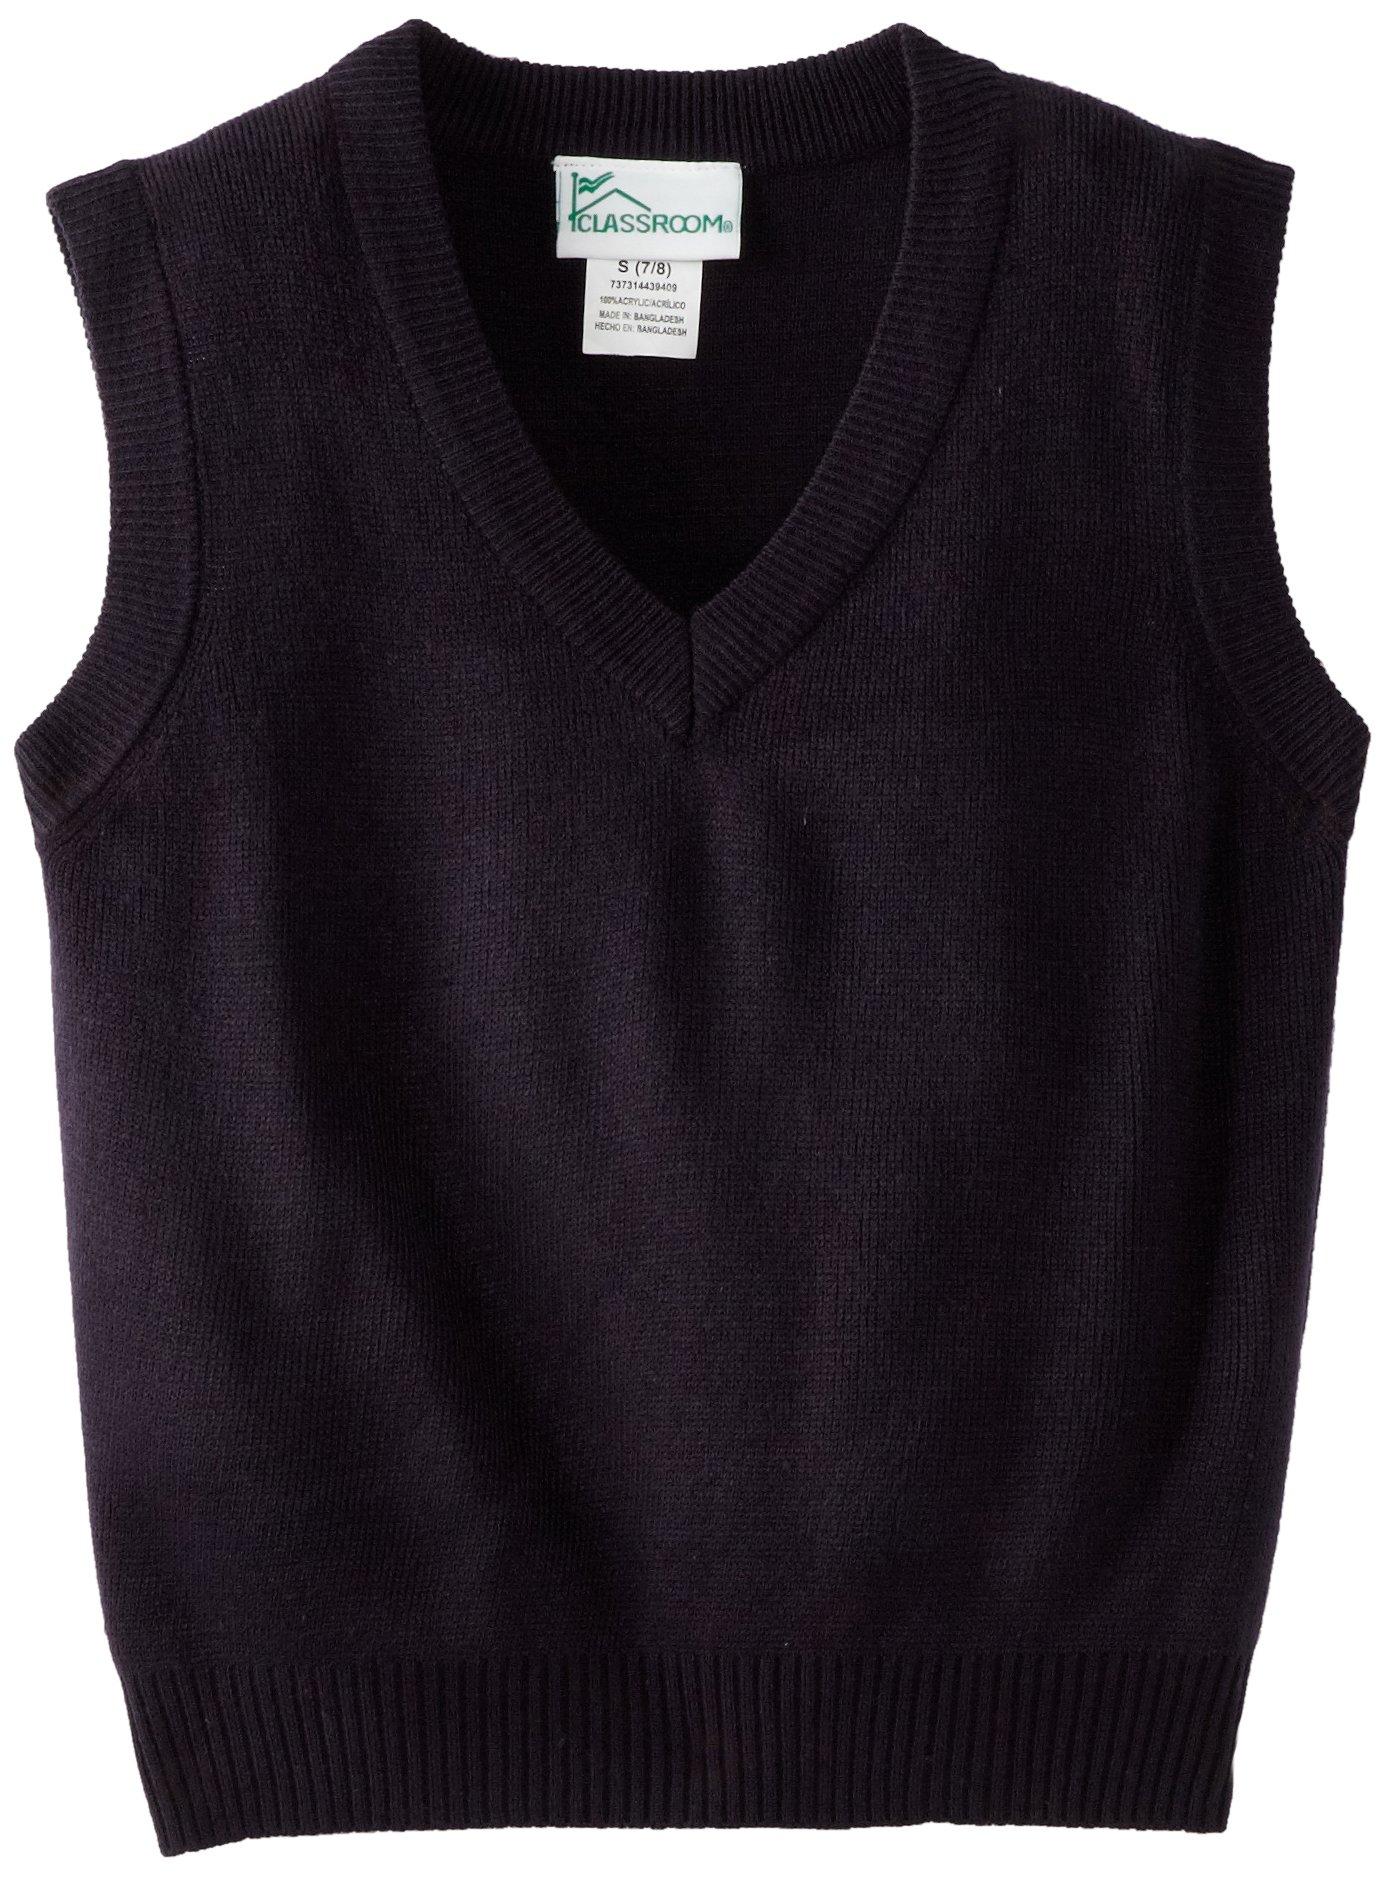 CLASSROOM Big Boys' Uniform Sweater Vest, Dark Navy, Medium